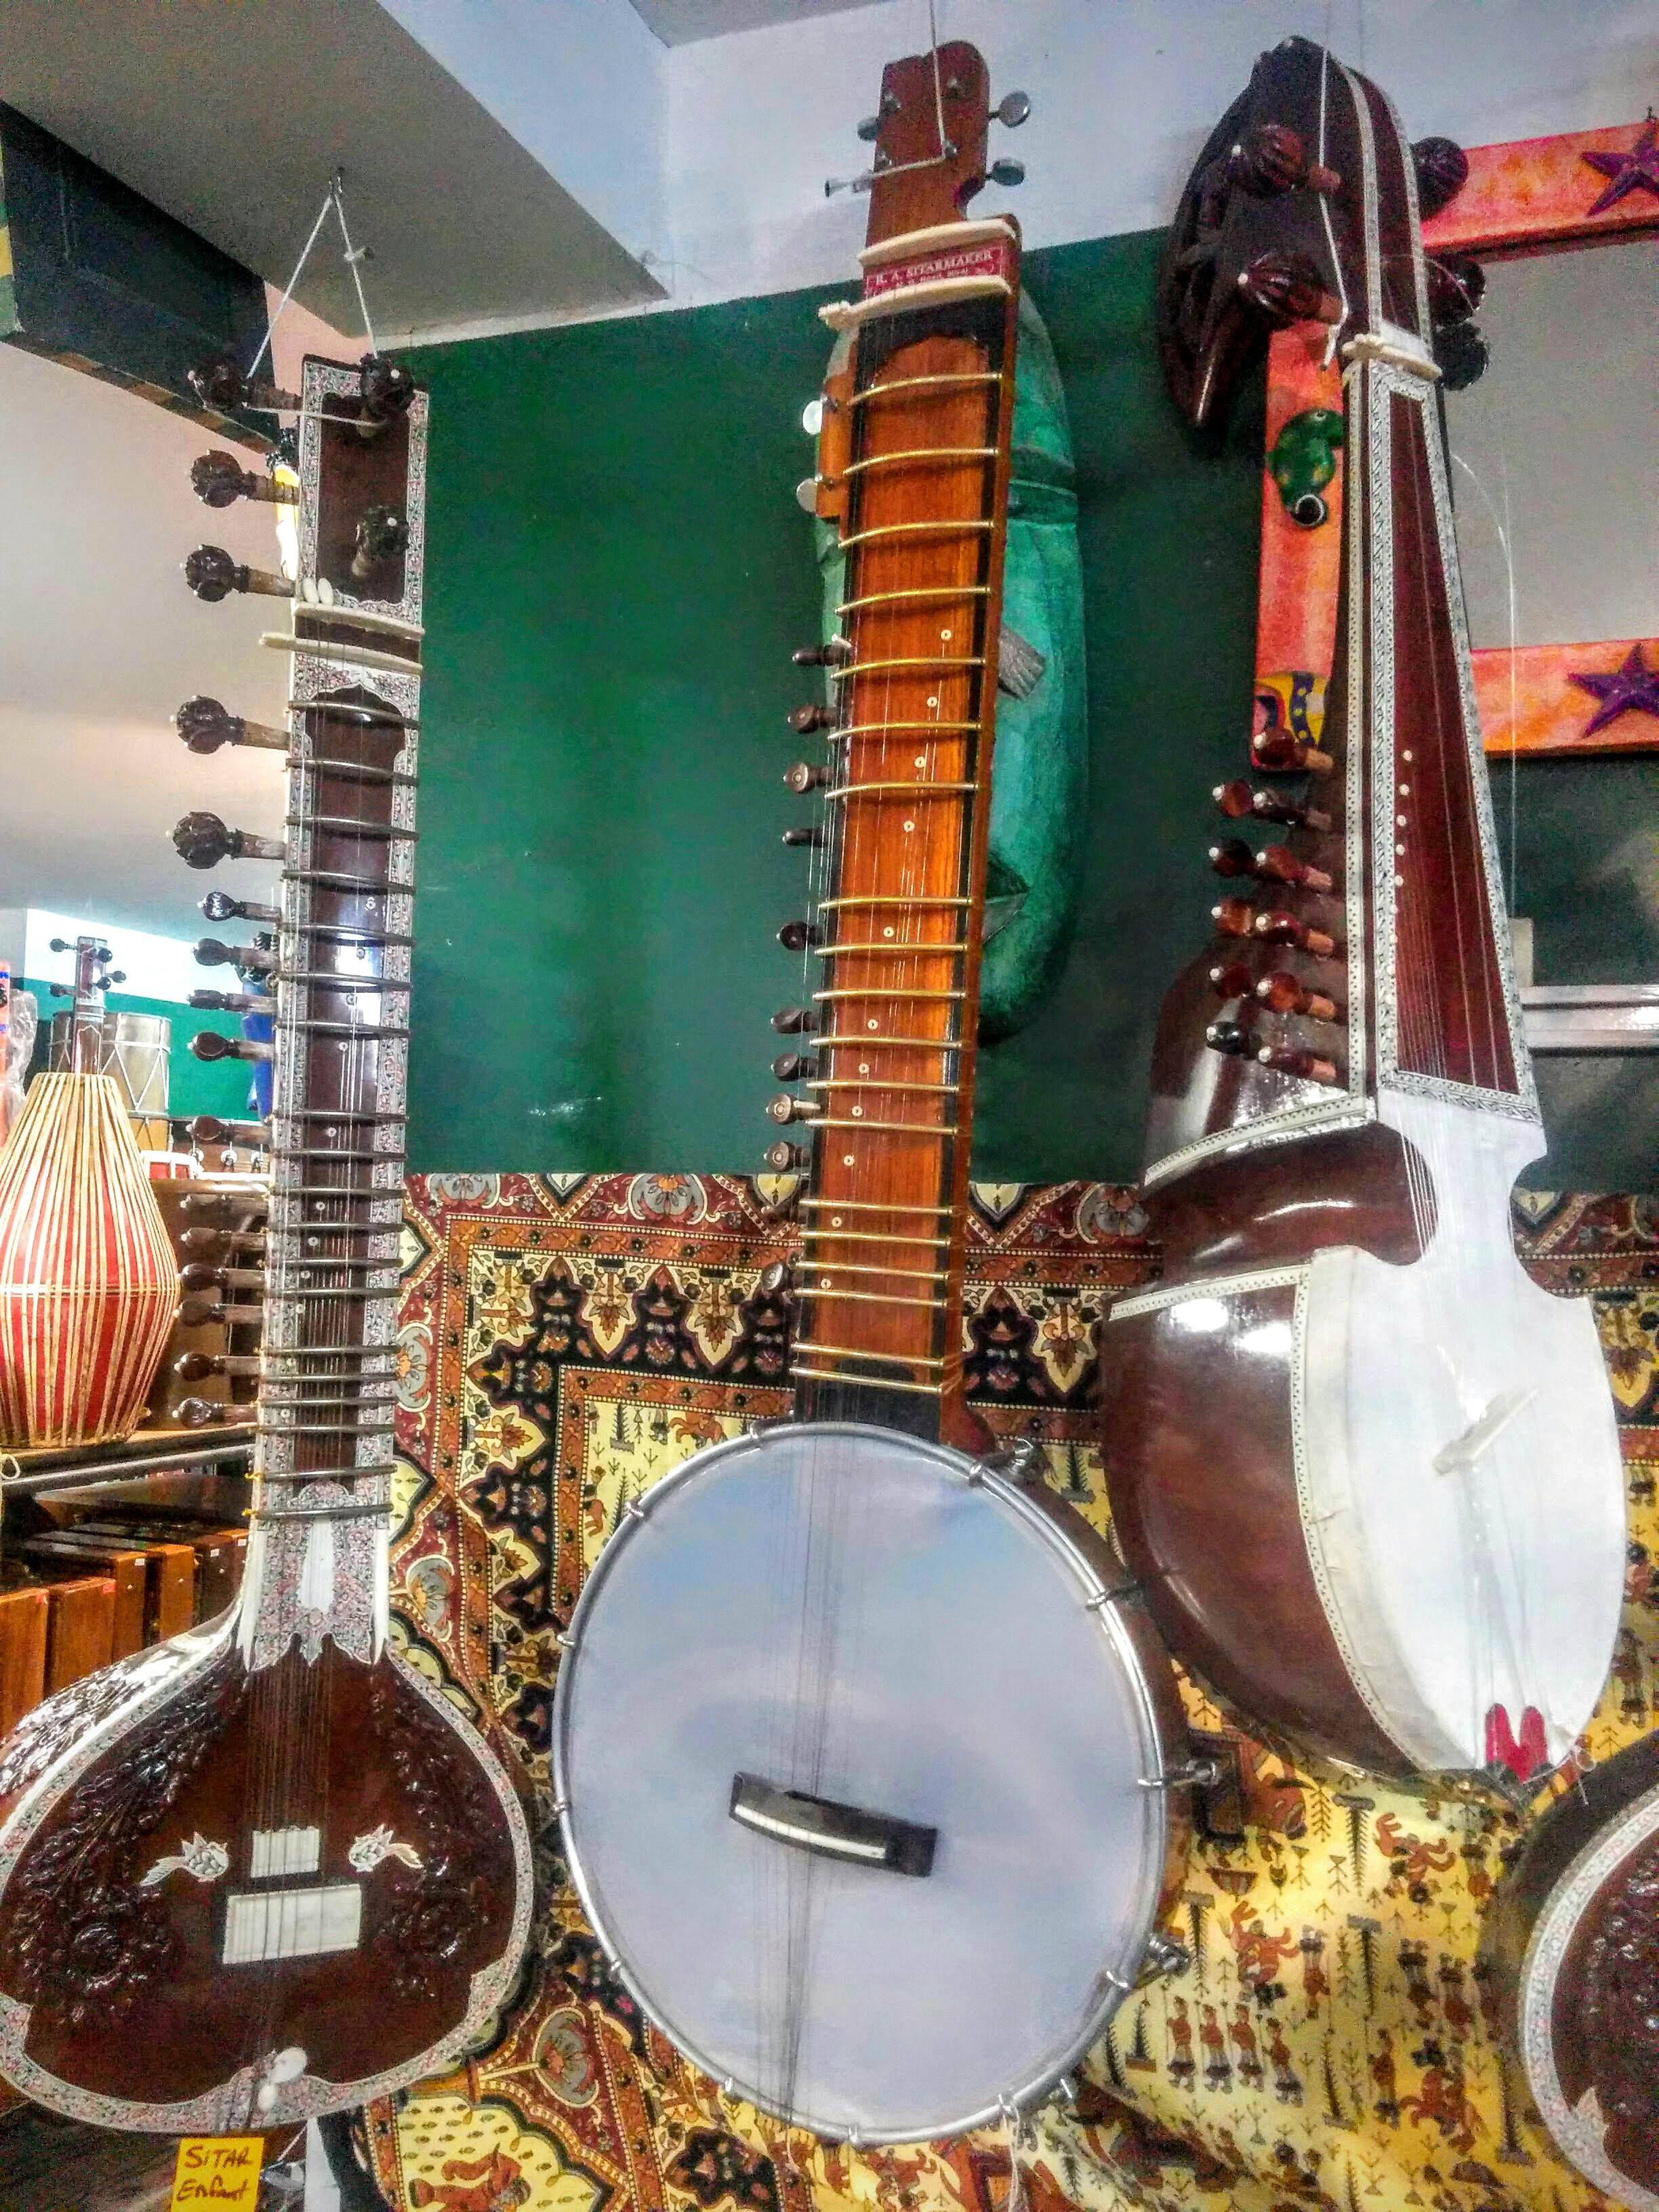 Sitar, Banjo Sitar, Rebab